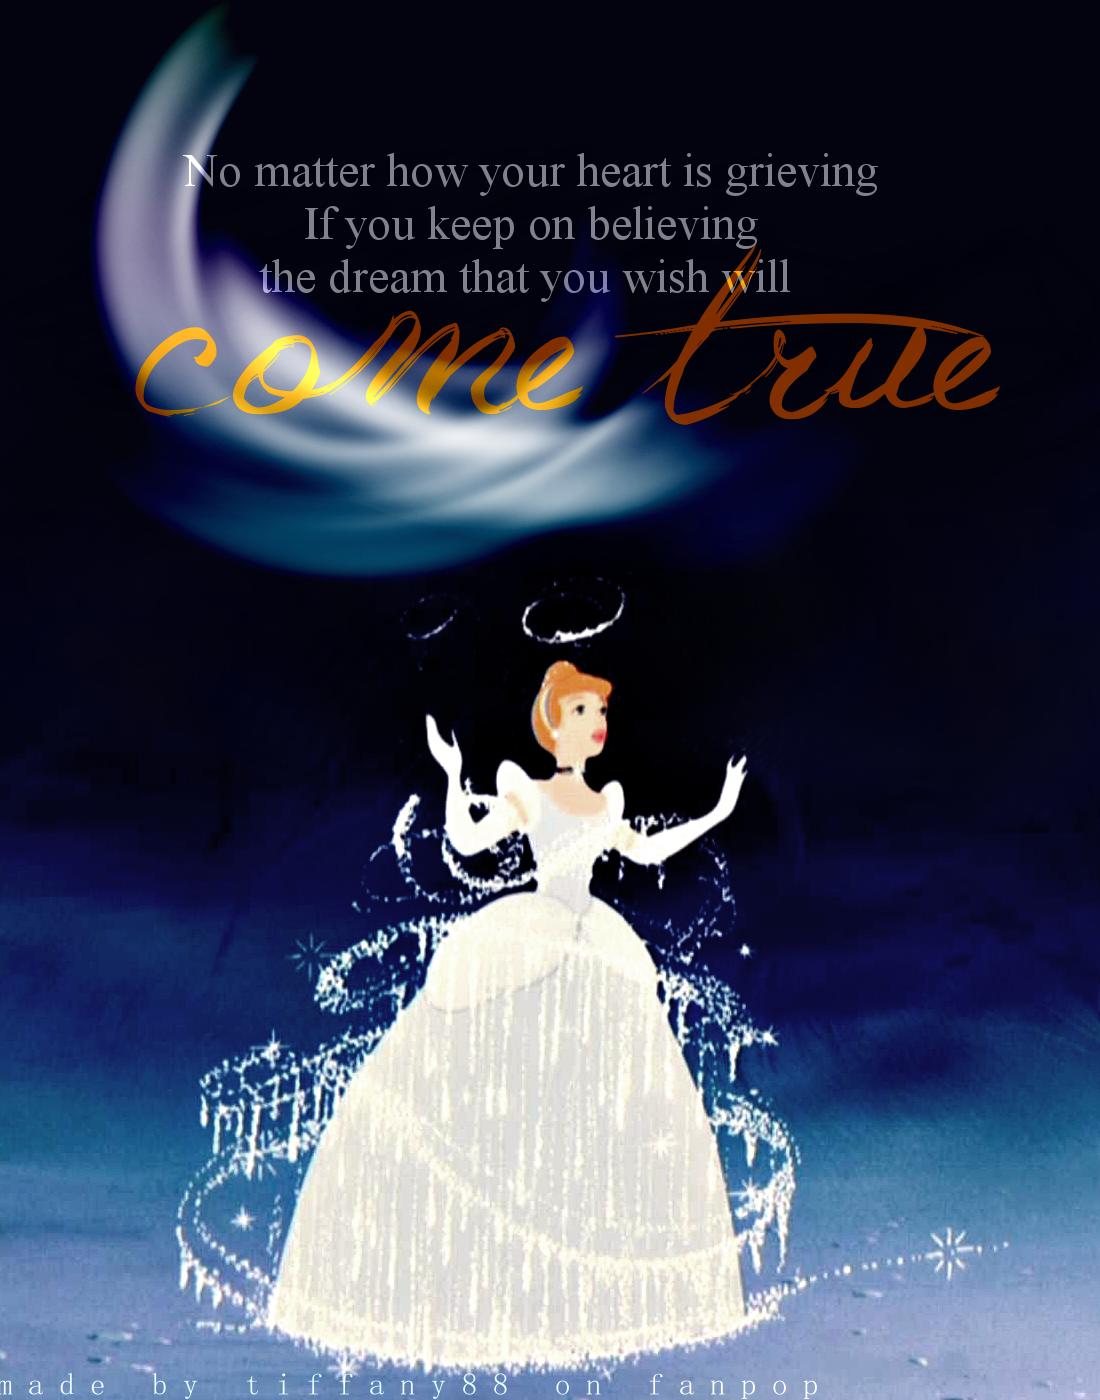 Cinderella Dream come true Dreams come true quotes